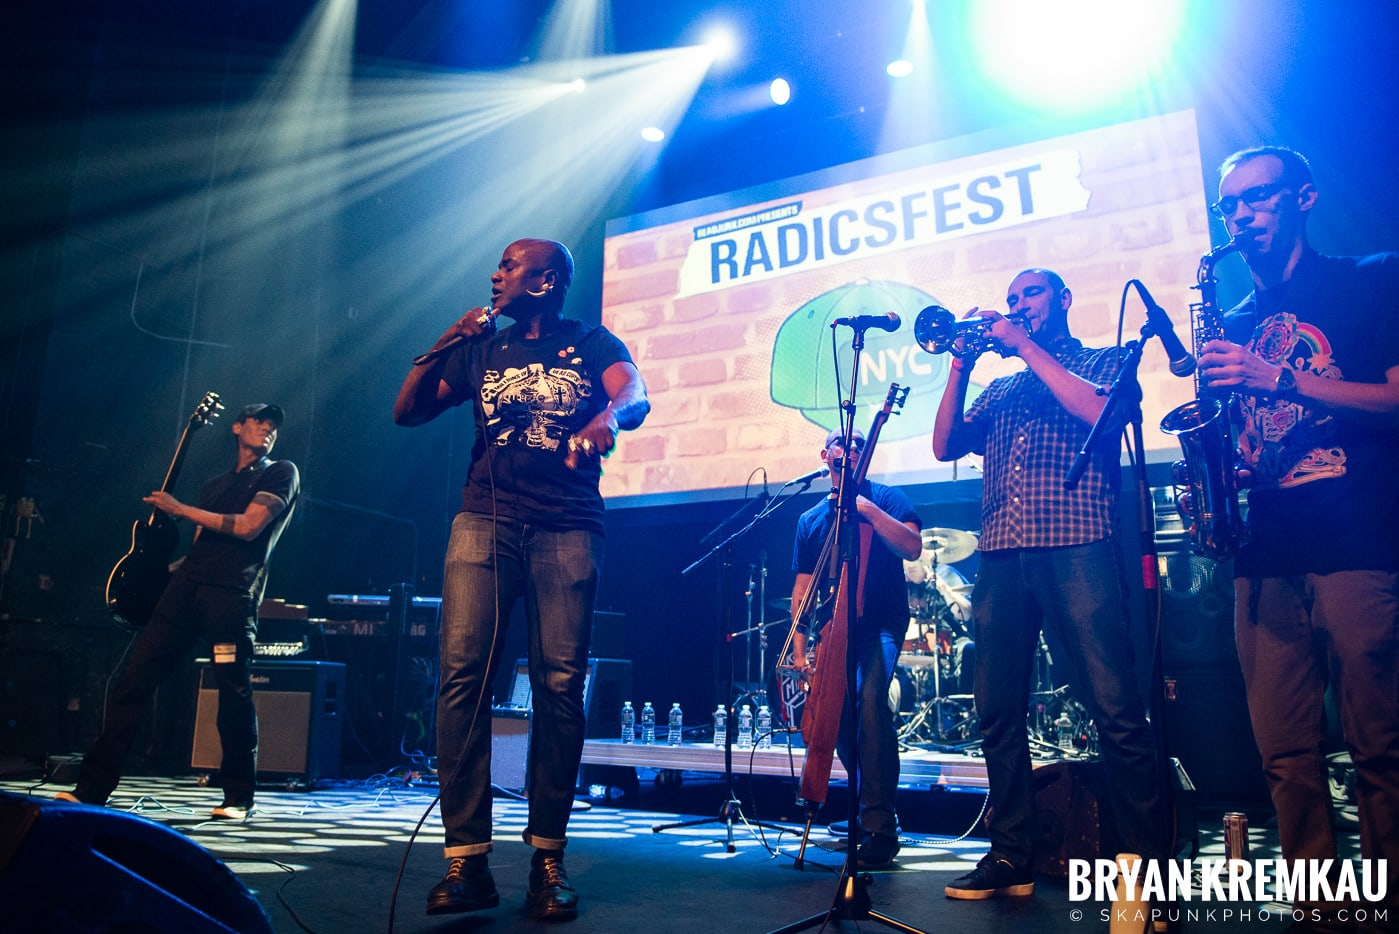 Mephiskapheles @ Radicsfest, Gramercy Theatre, NYC - 7.19.19 (17)